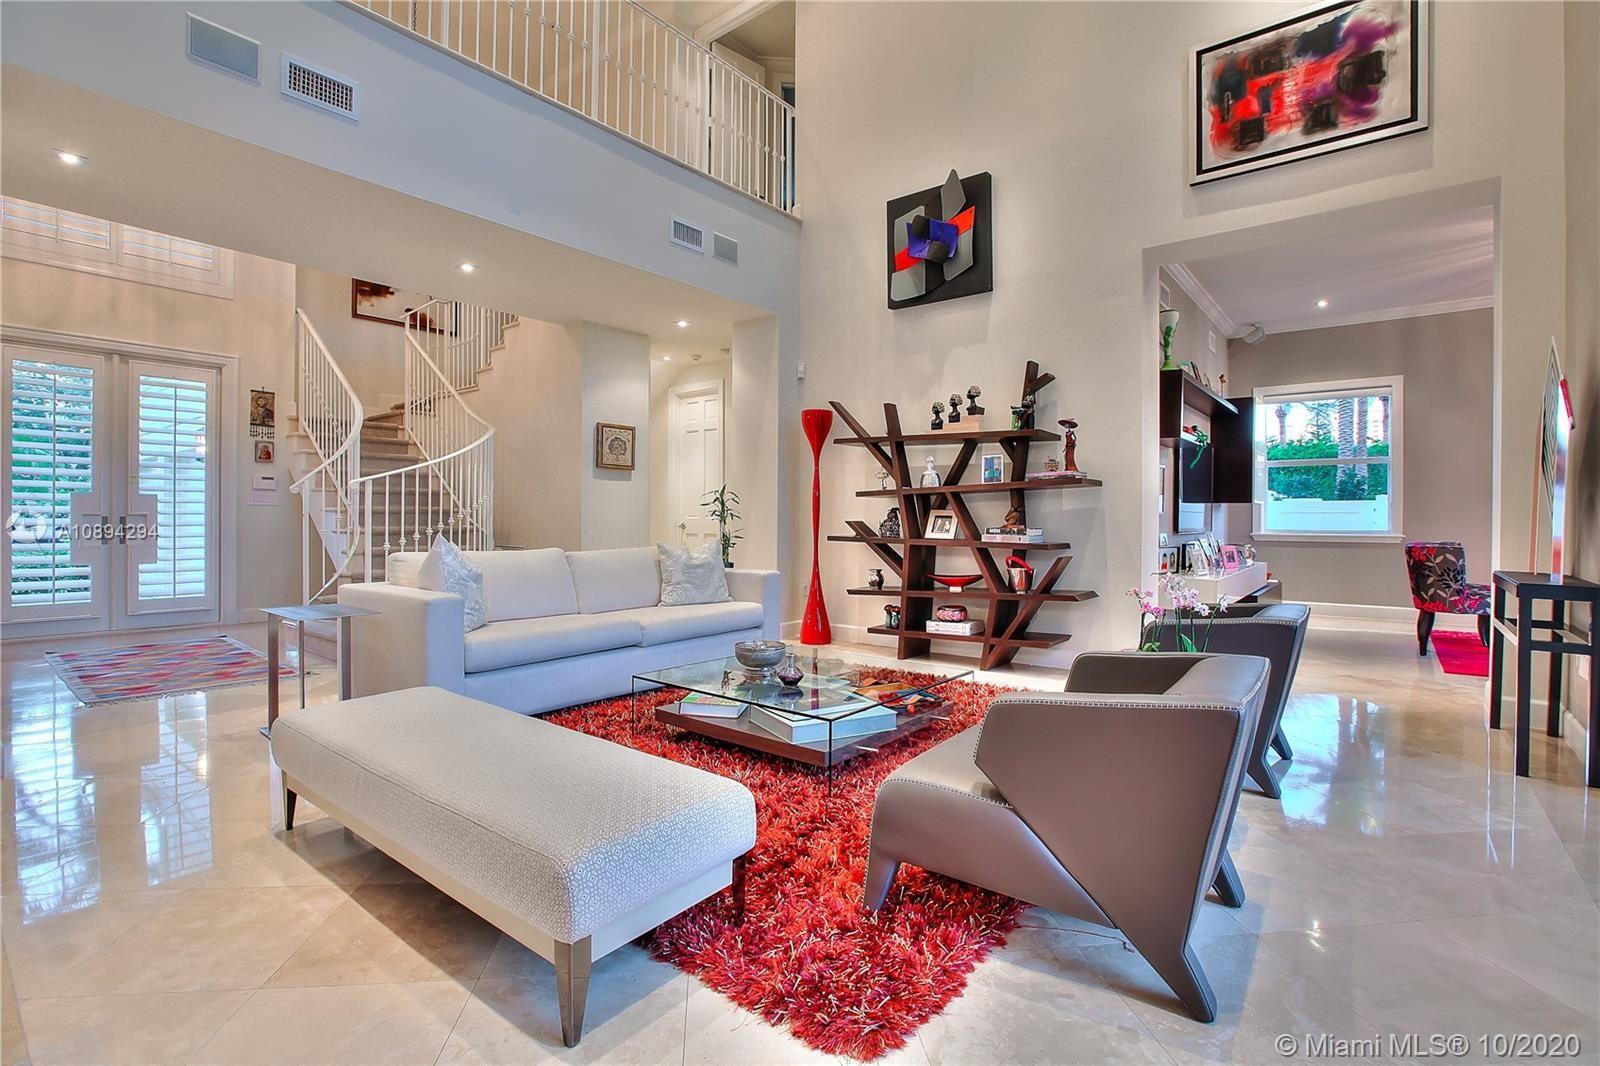 27 Grand Bay Estates Cir, Key Biscayne, FL 33149 - #: A10894294